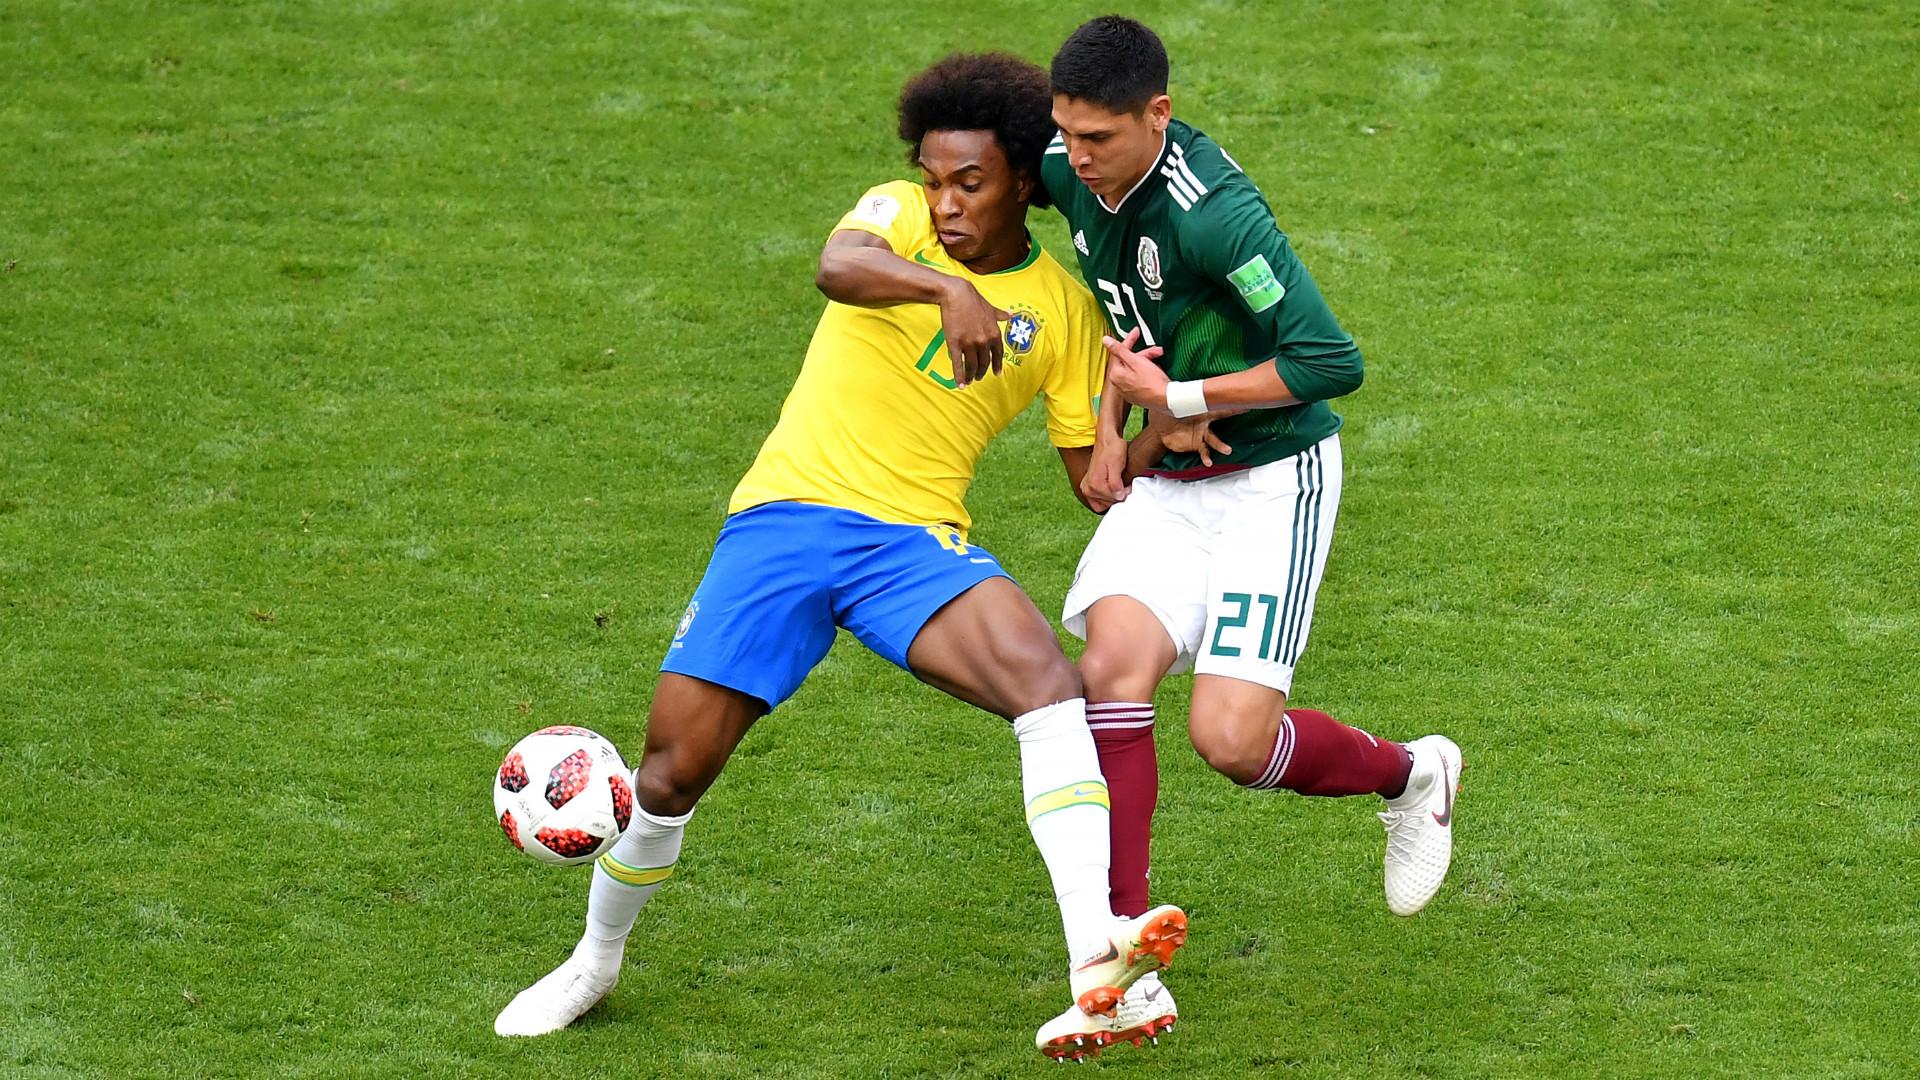 Willian Edson Alvarez Brazil Mexico 2018 World Cup